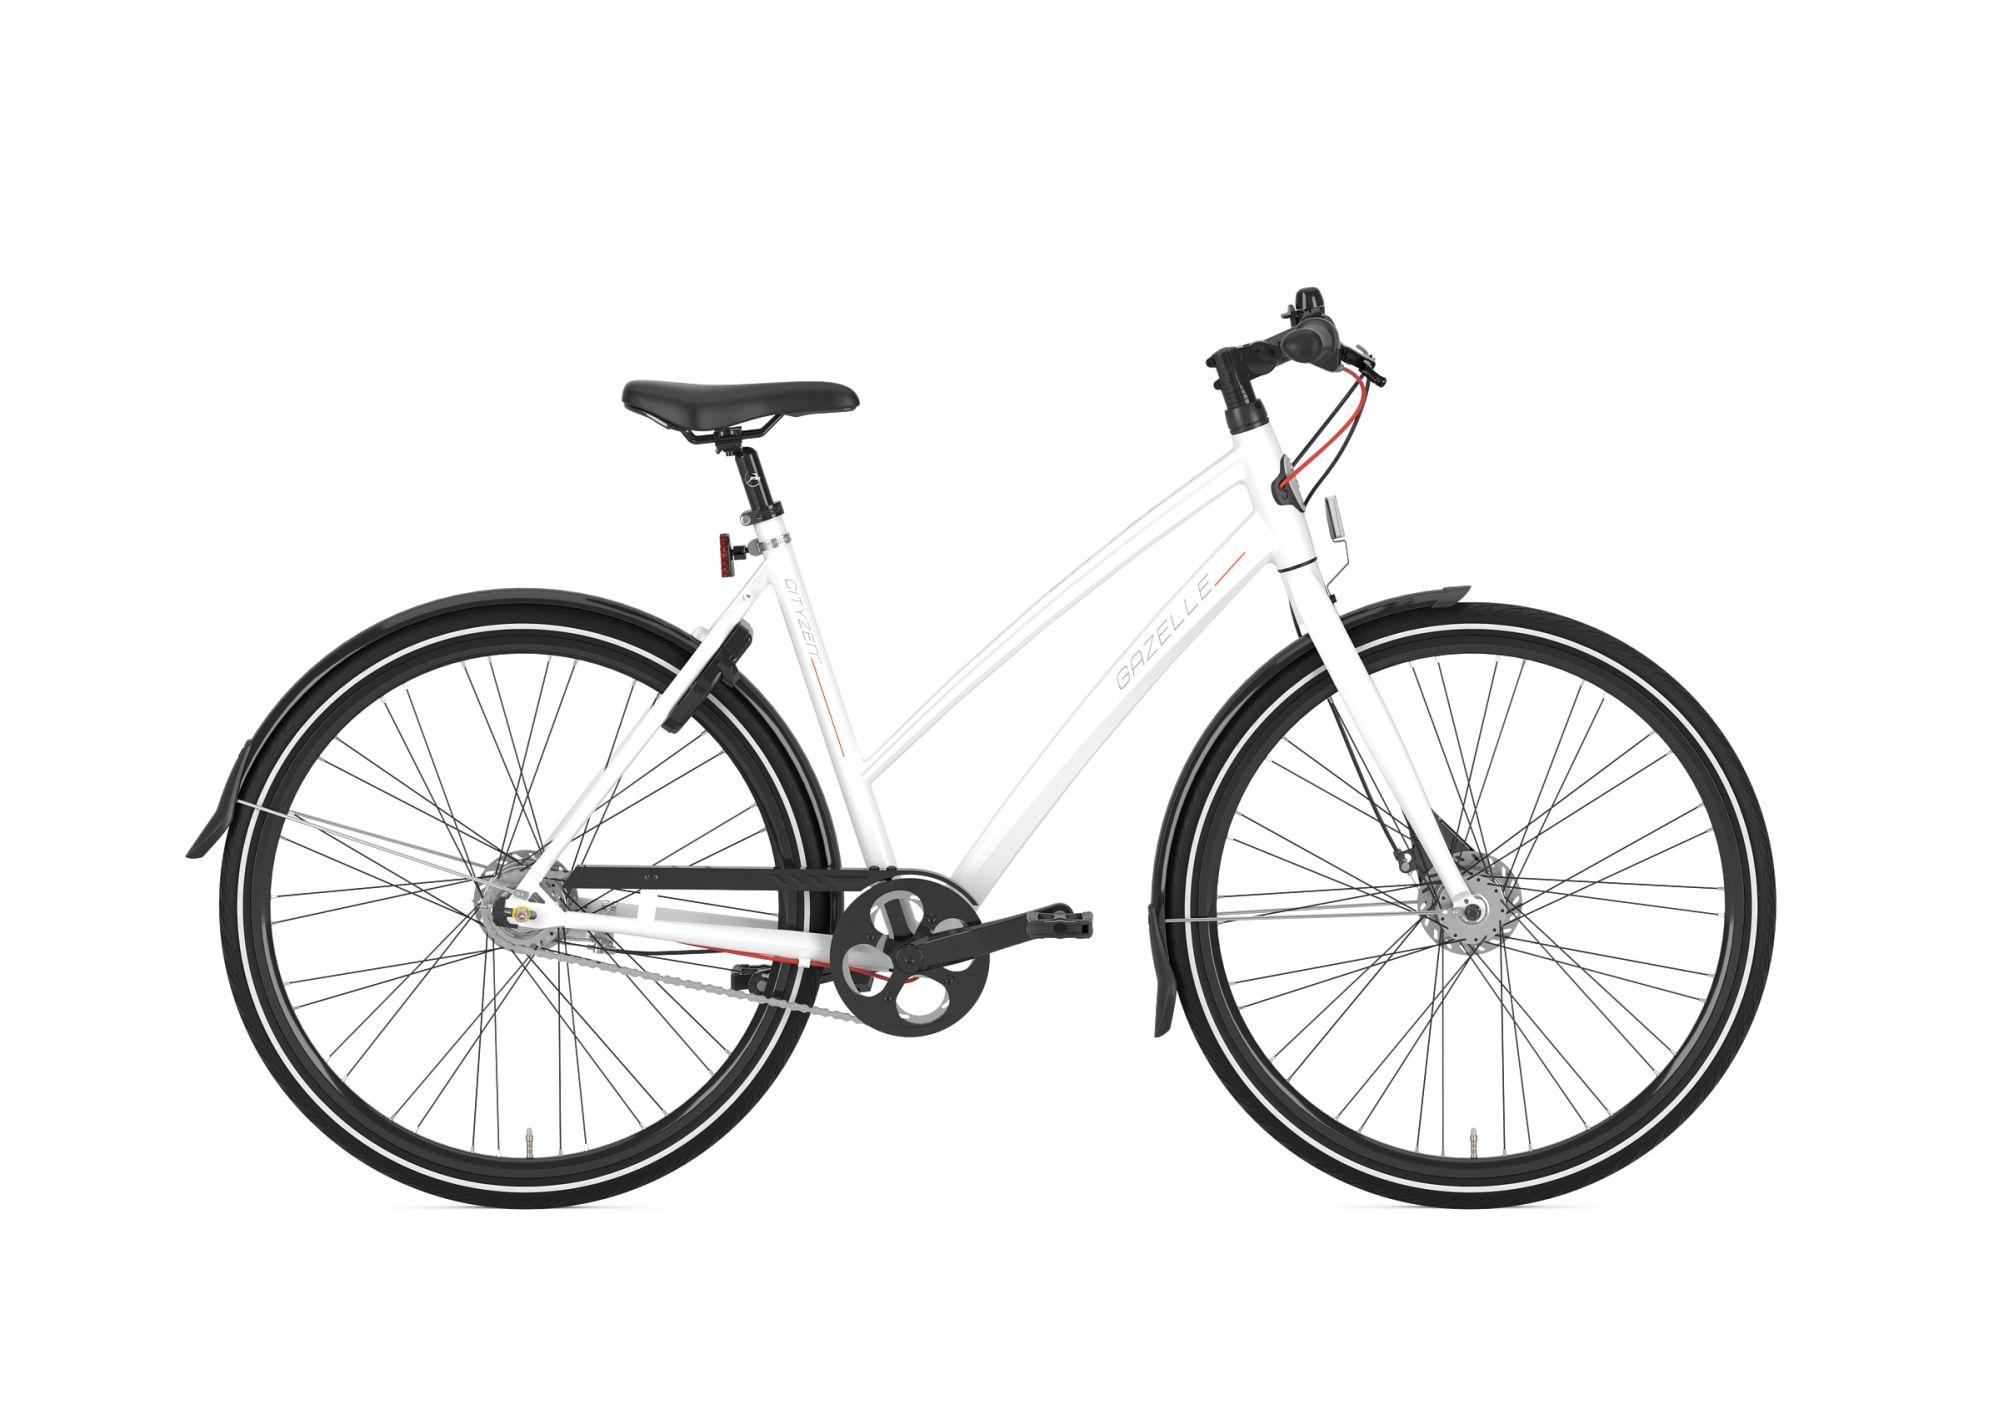 city-/tourenräder/Citybikes: Gazelle  CityZen C7 Damenfahrrad Damen Modell 2019 28 Zoll 53 cm